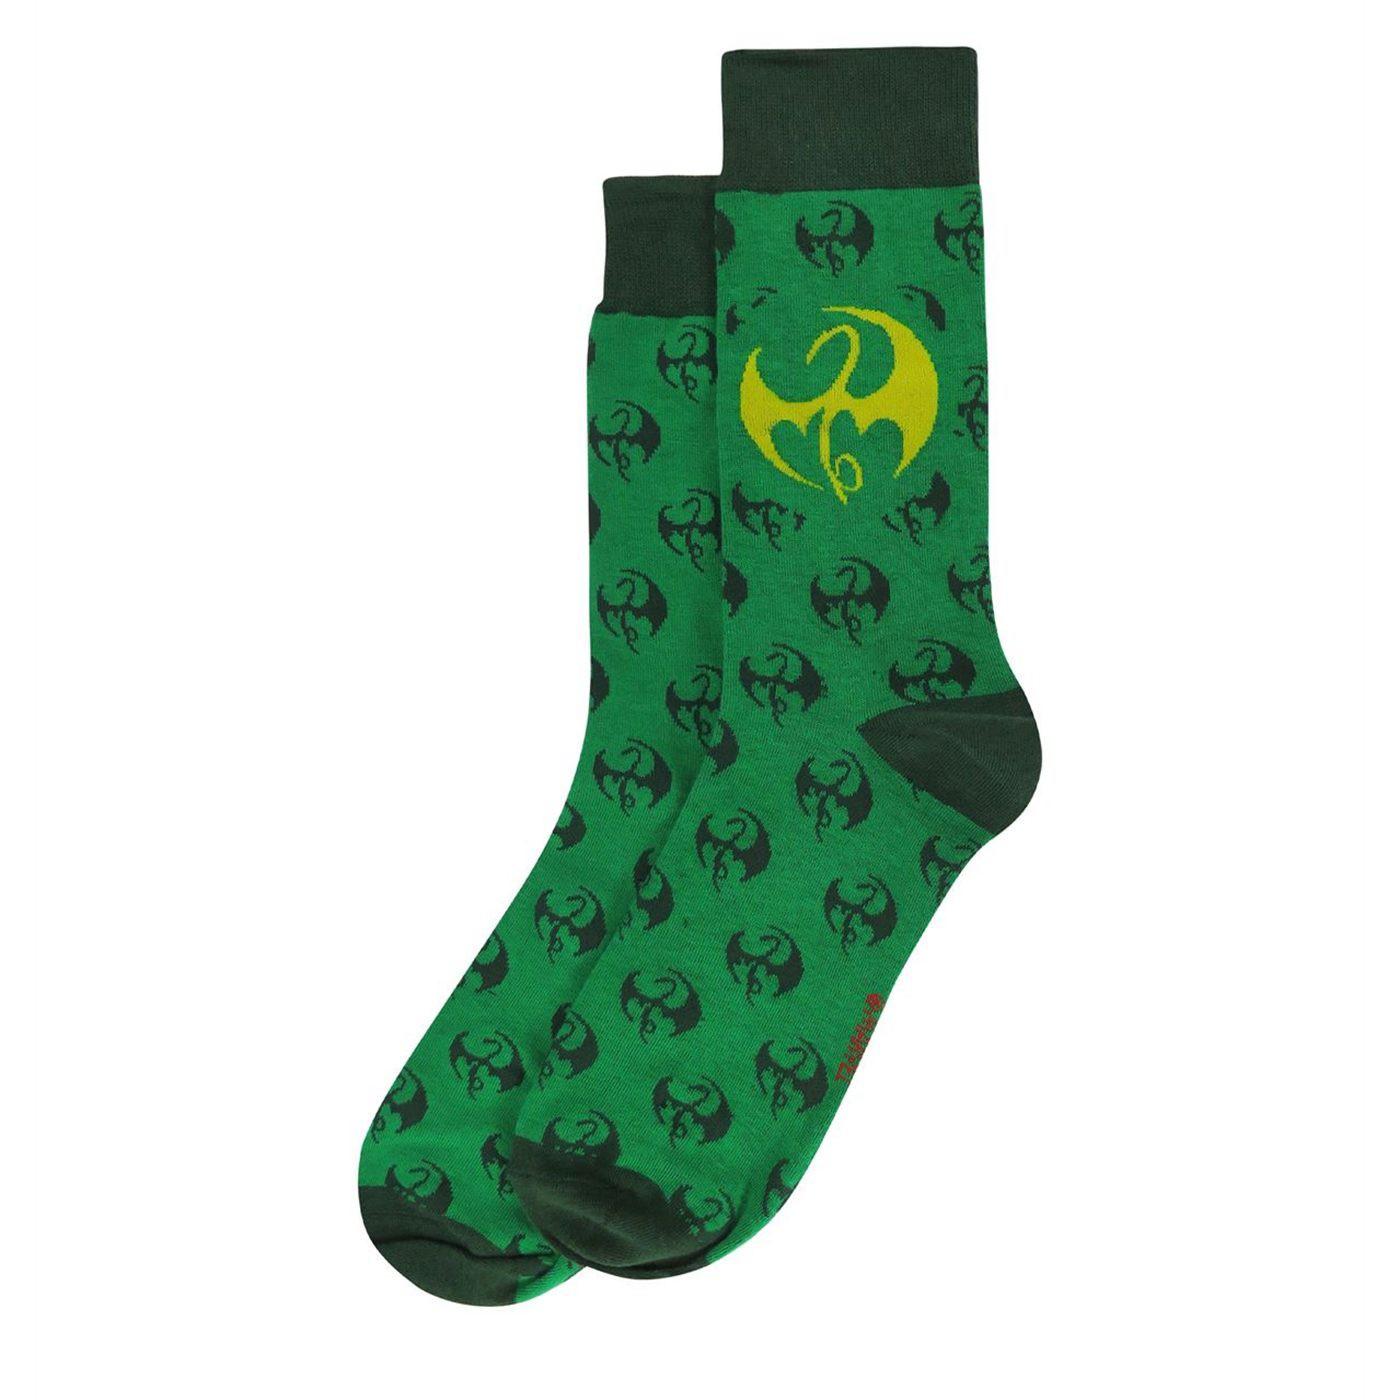 Iron Fist Symbols Sock 2-Pack